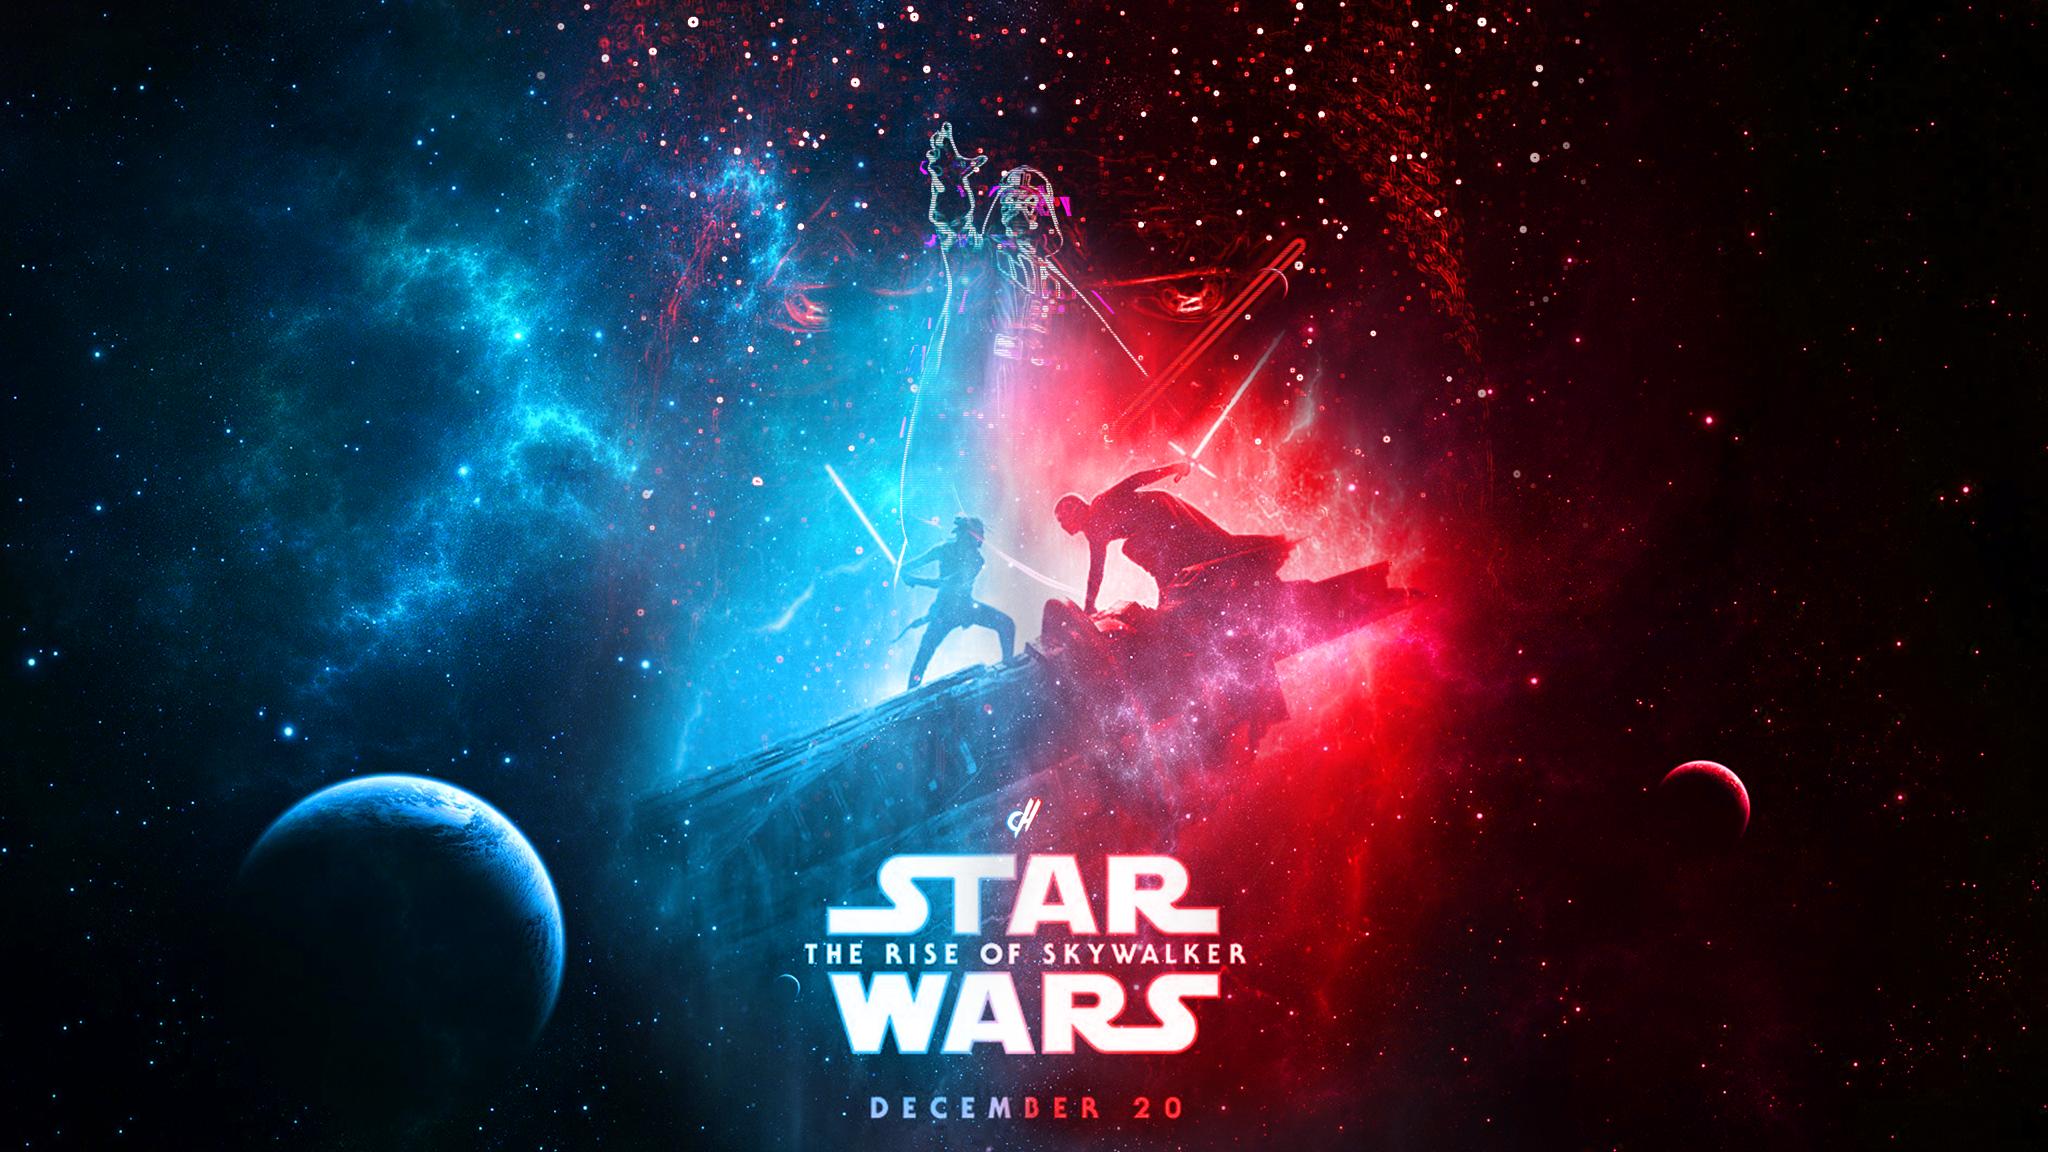 Star Wars The Rise Of Skywalker 2048x1152 Wallpaper Teahub Io